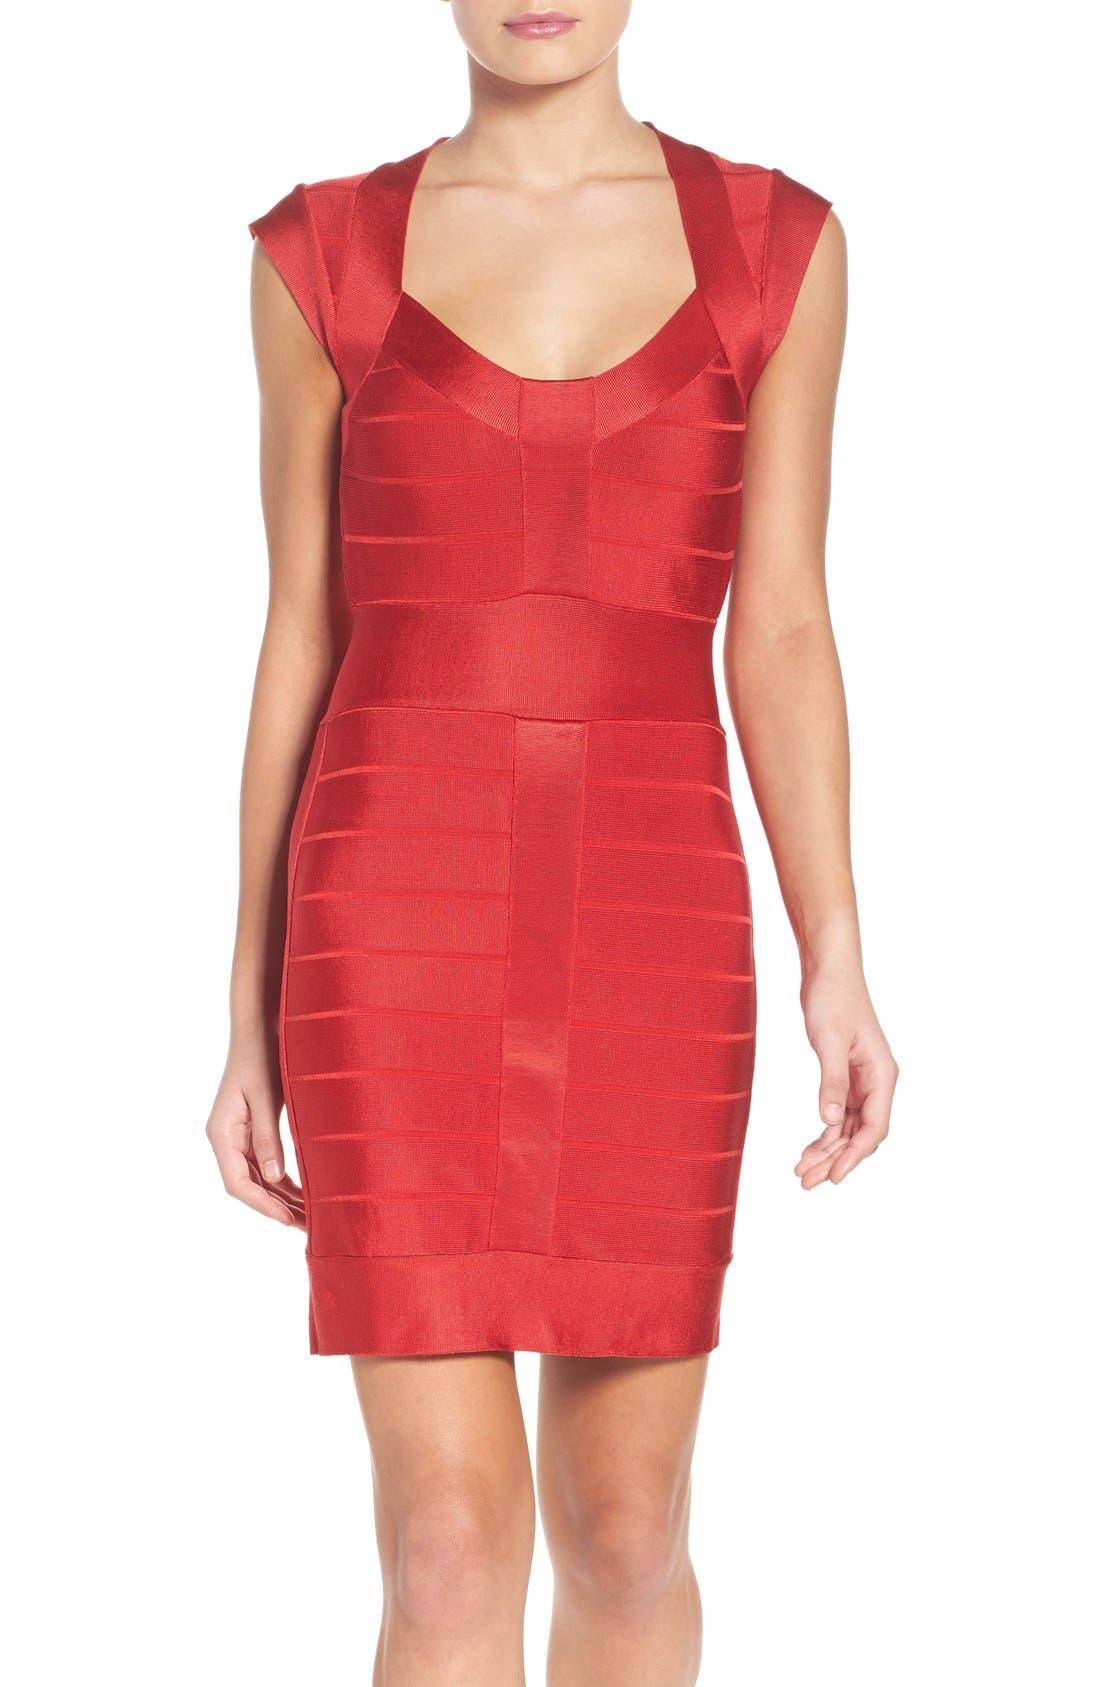 Alternate Image 1 Selected - French Connection Spotlight Bandage Dress